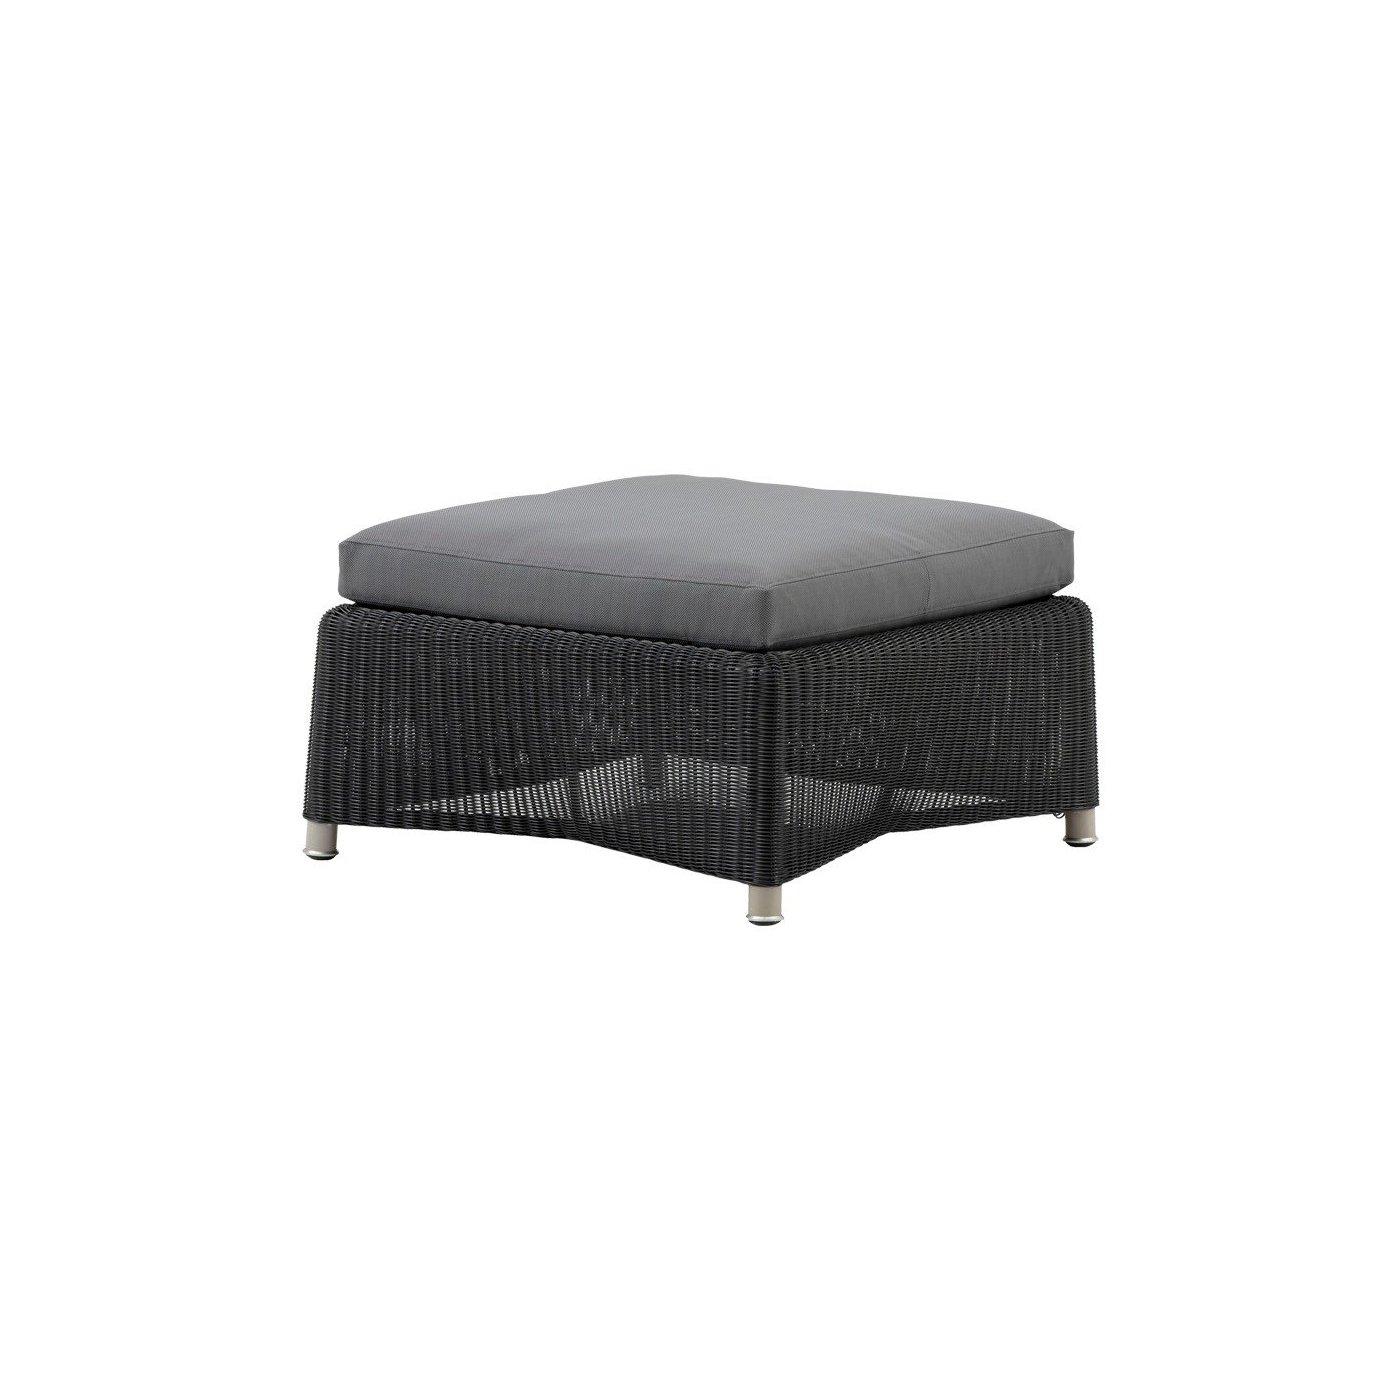 cane line loungehocker diamond aus geflecht jetzt besonders g nstig. Black Bedroom Furniture Sets. Home Design Ideas